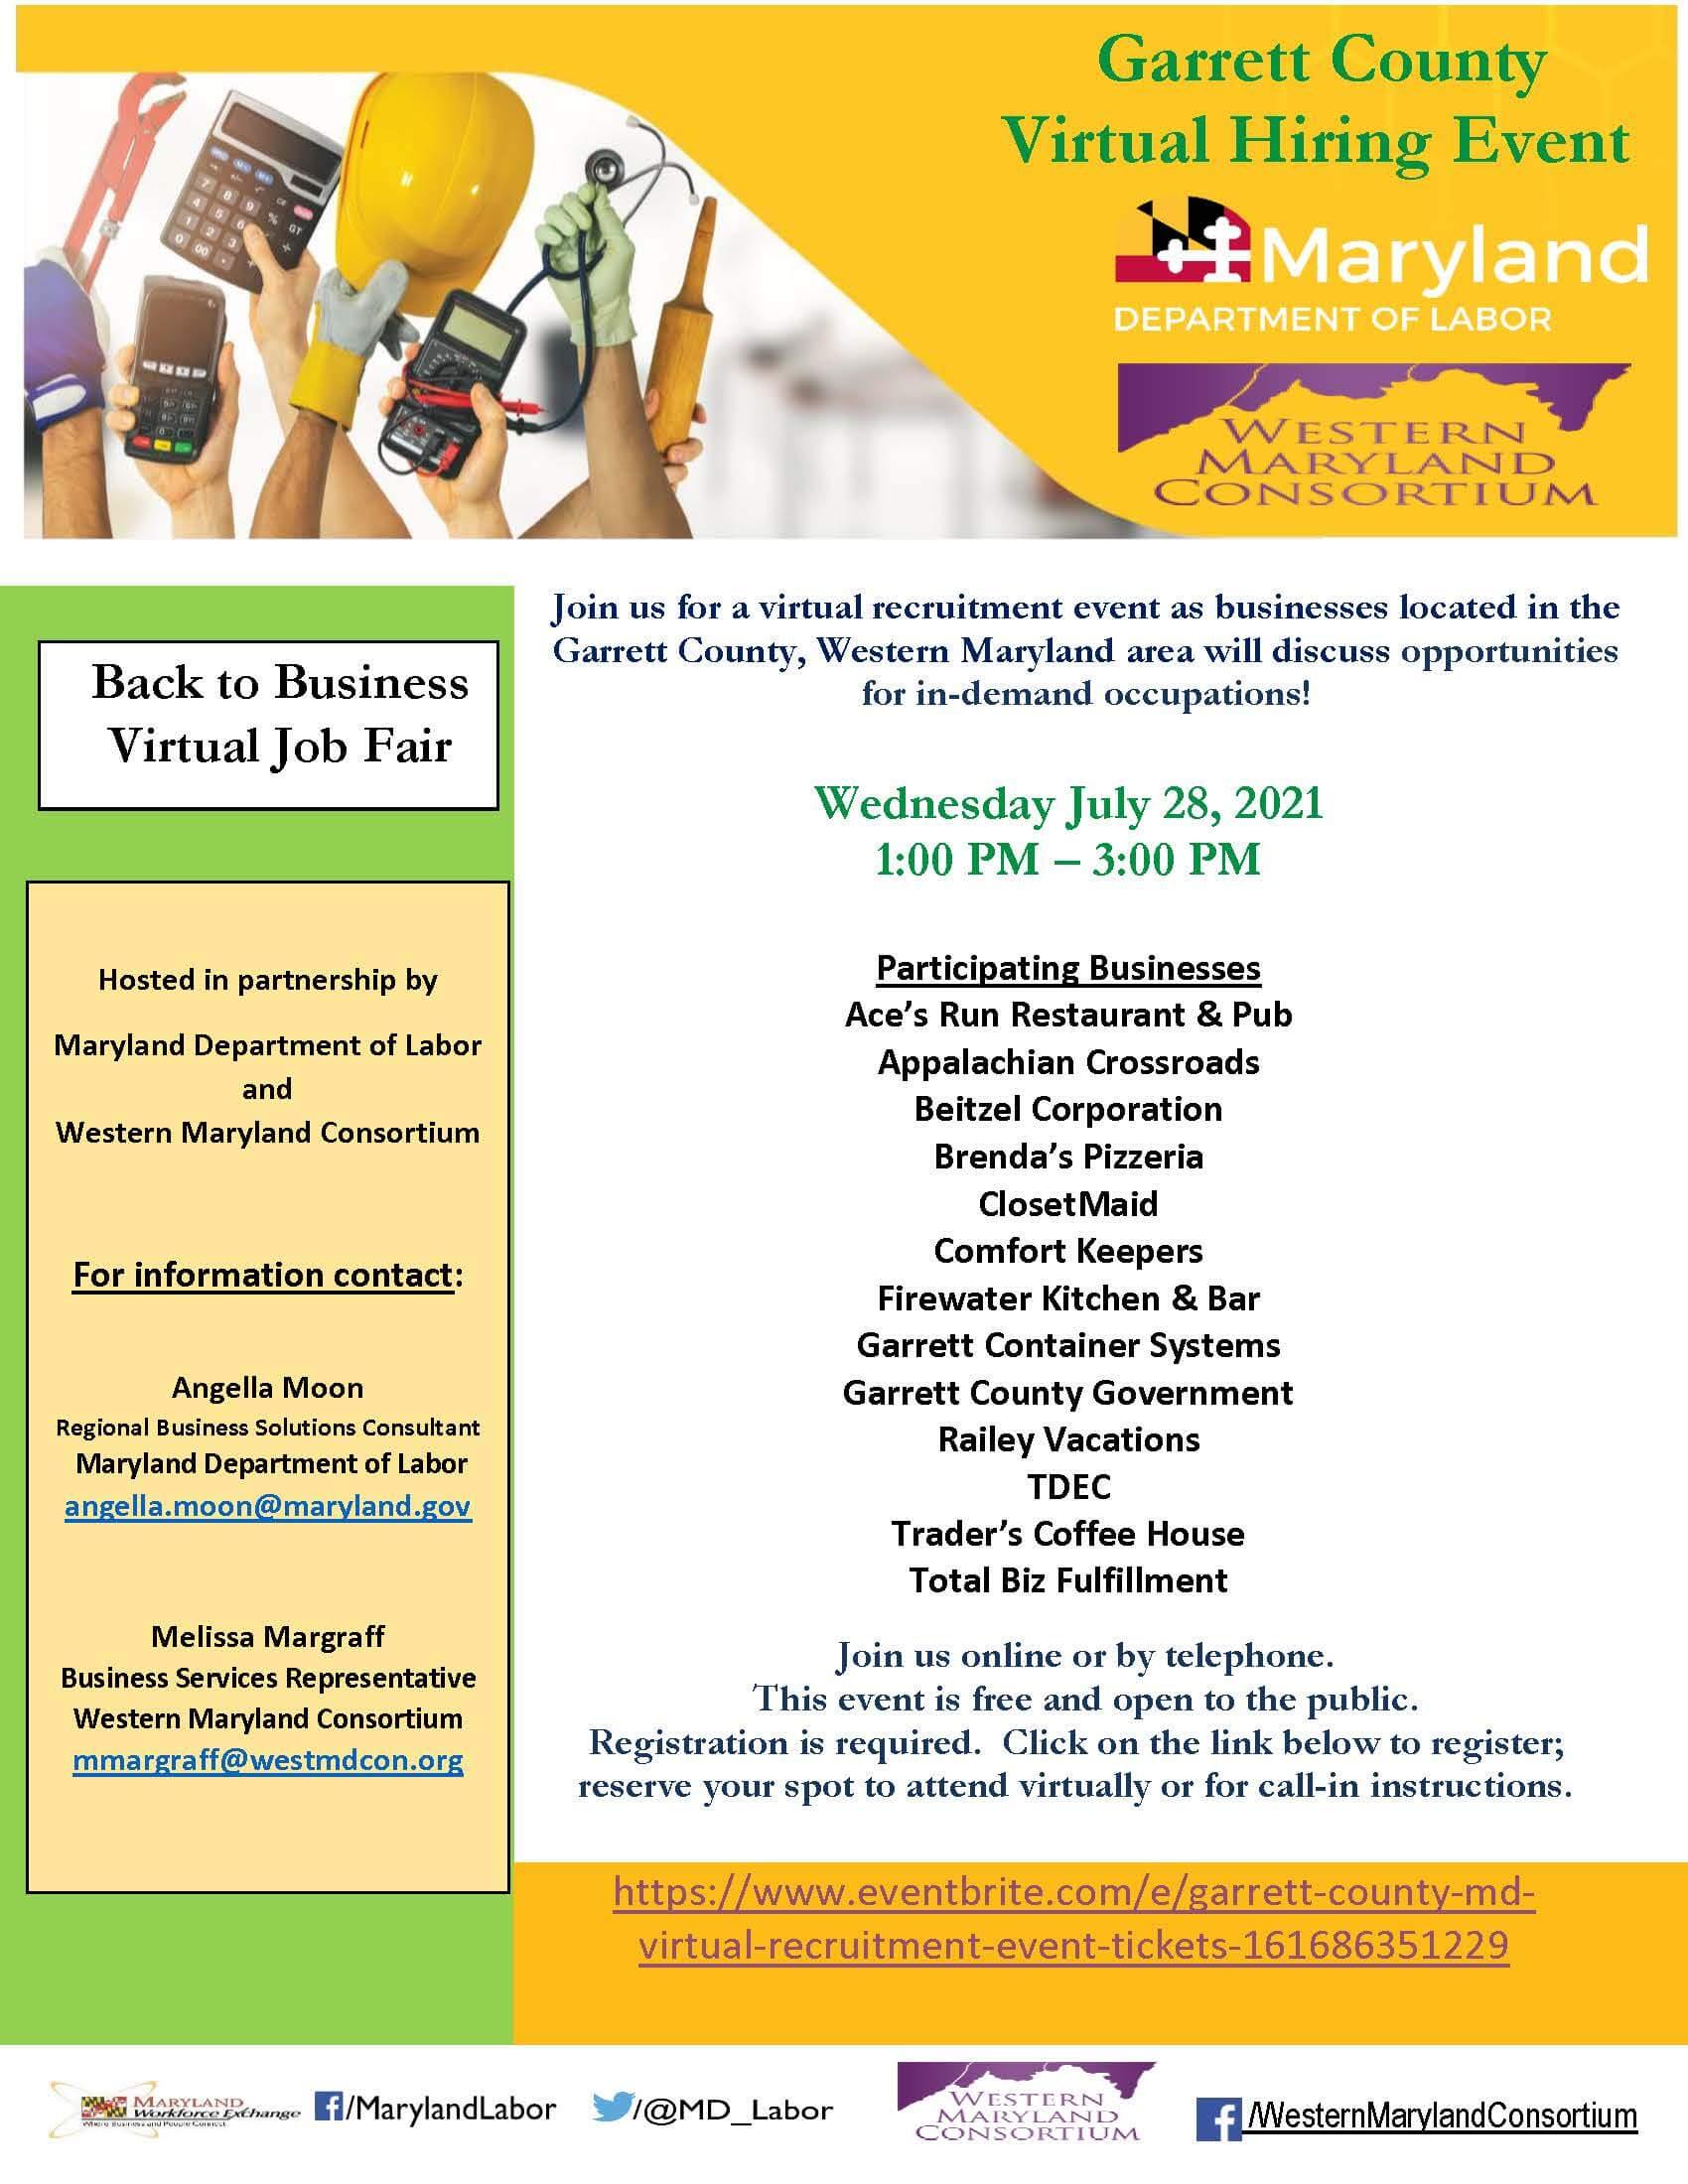 Garrett County Virtual Hiring Event